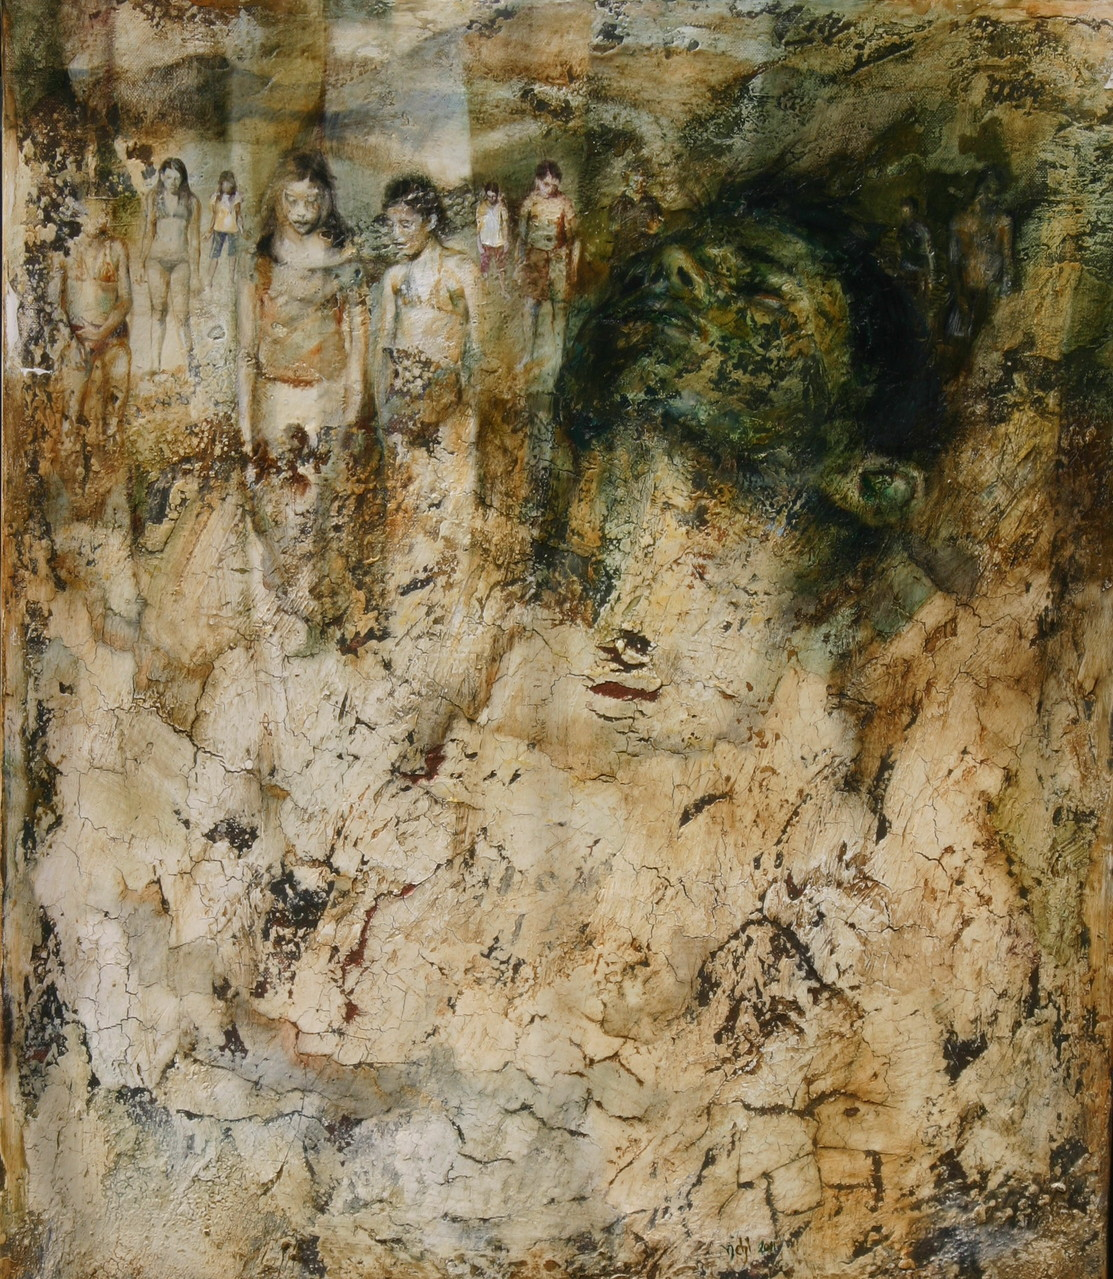 SETE. 2011, 70x60, olio su tela.